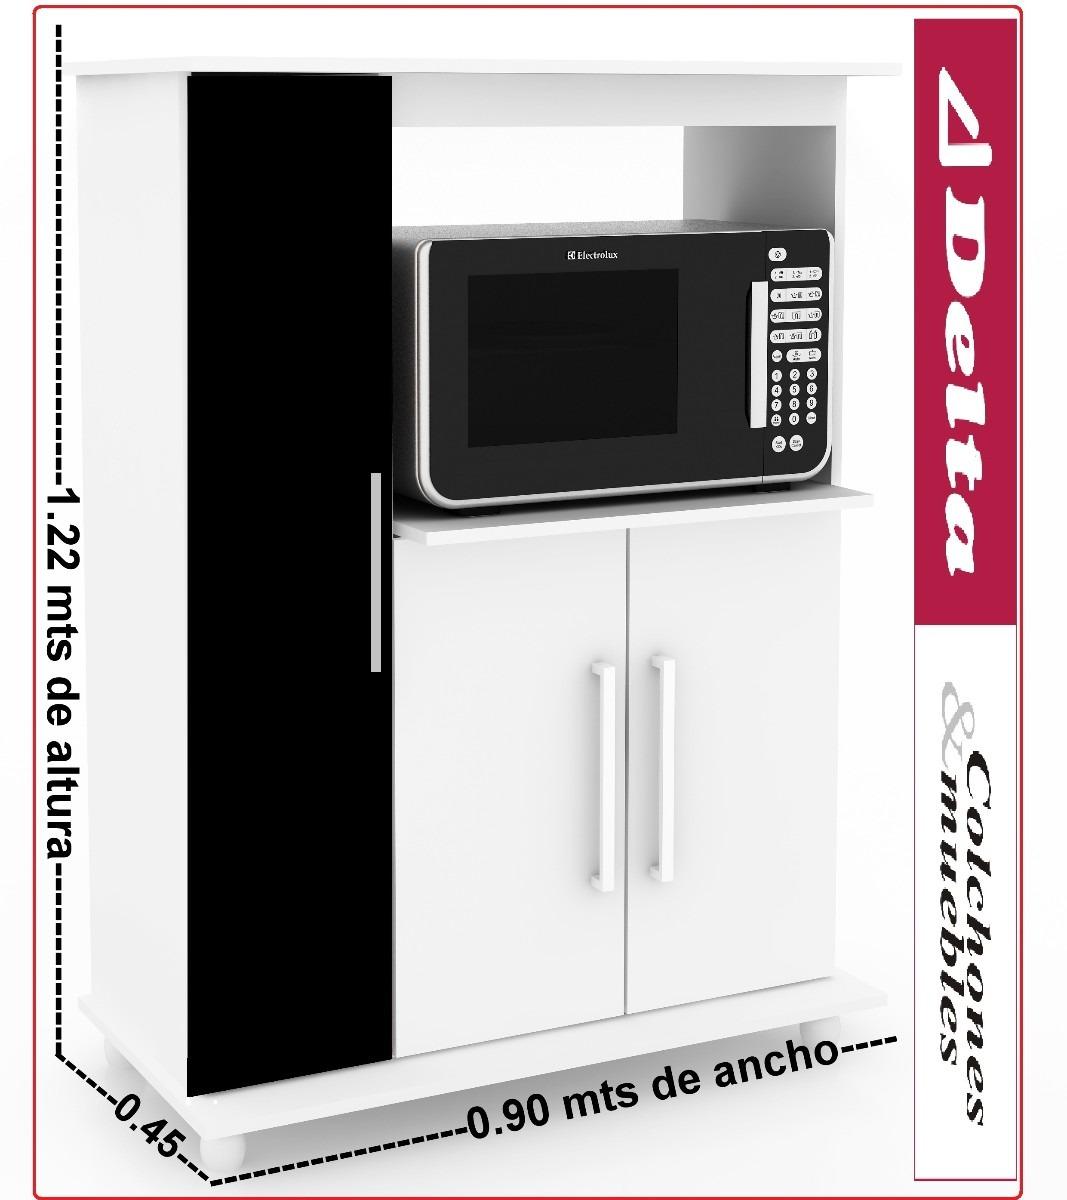 Mueble para microondas alacena kit de cocina equipamiento for Mueble alacena cocina